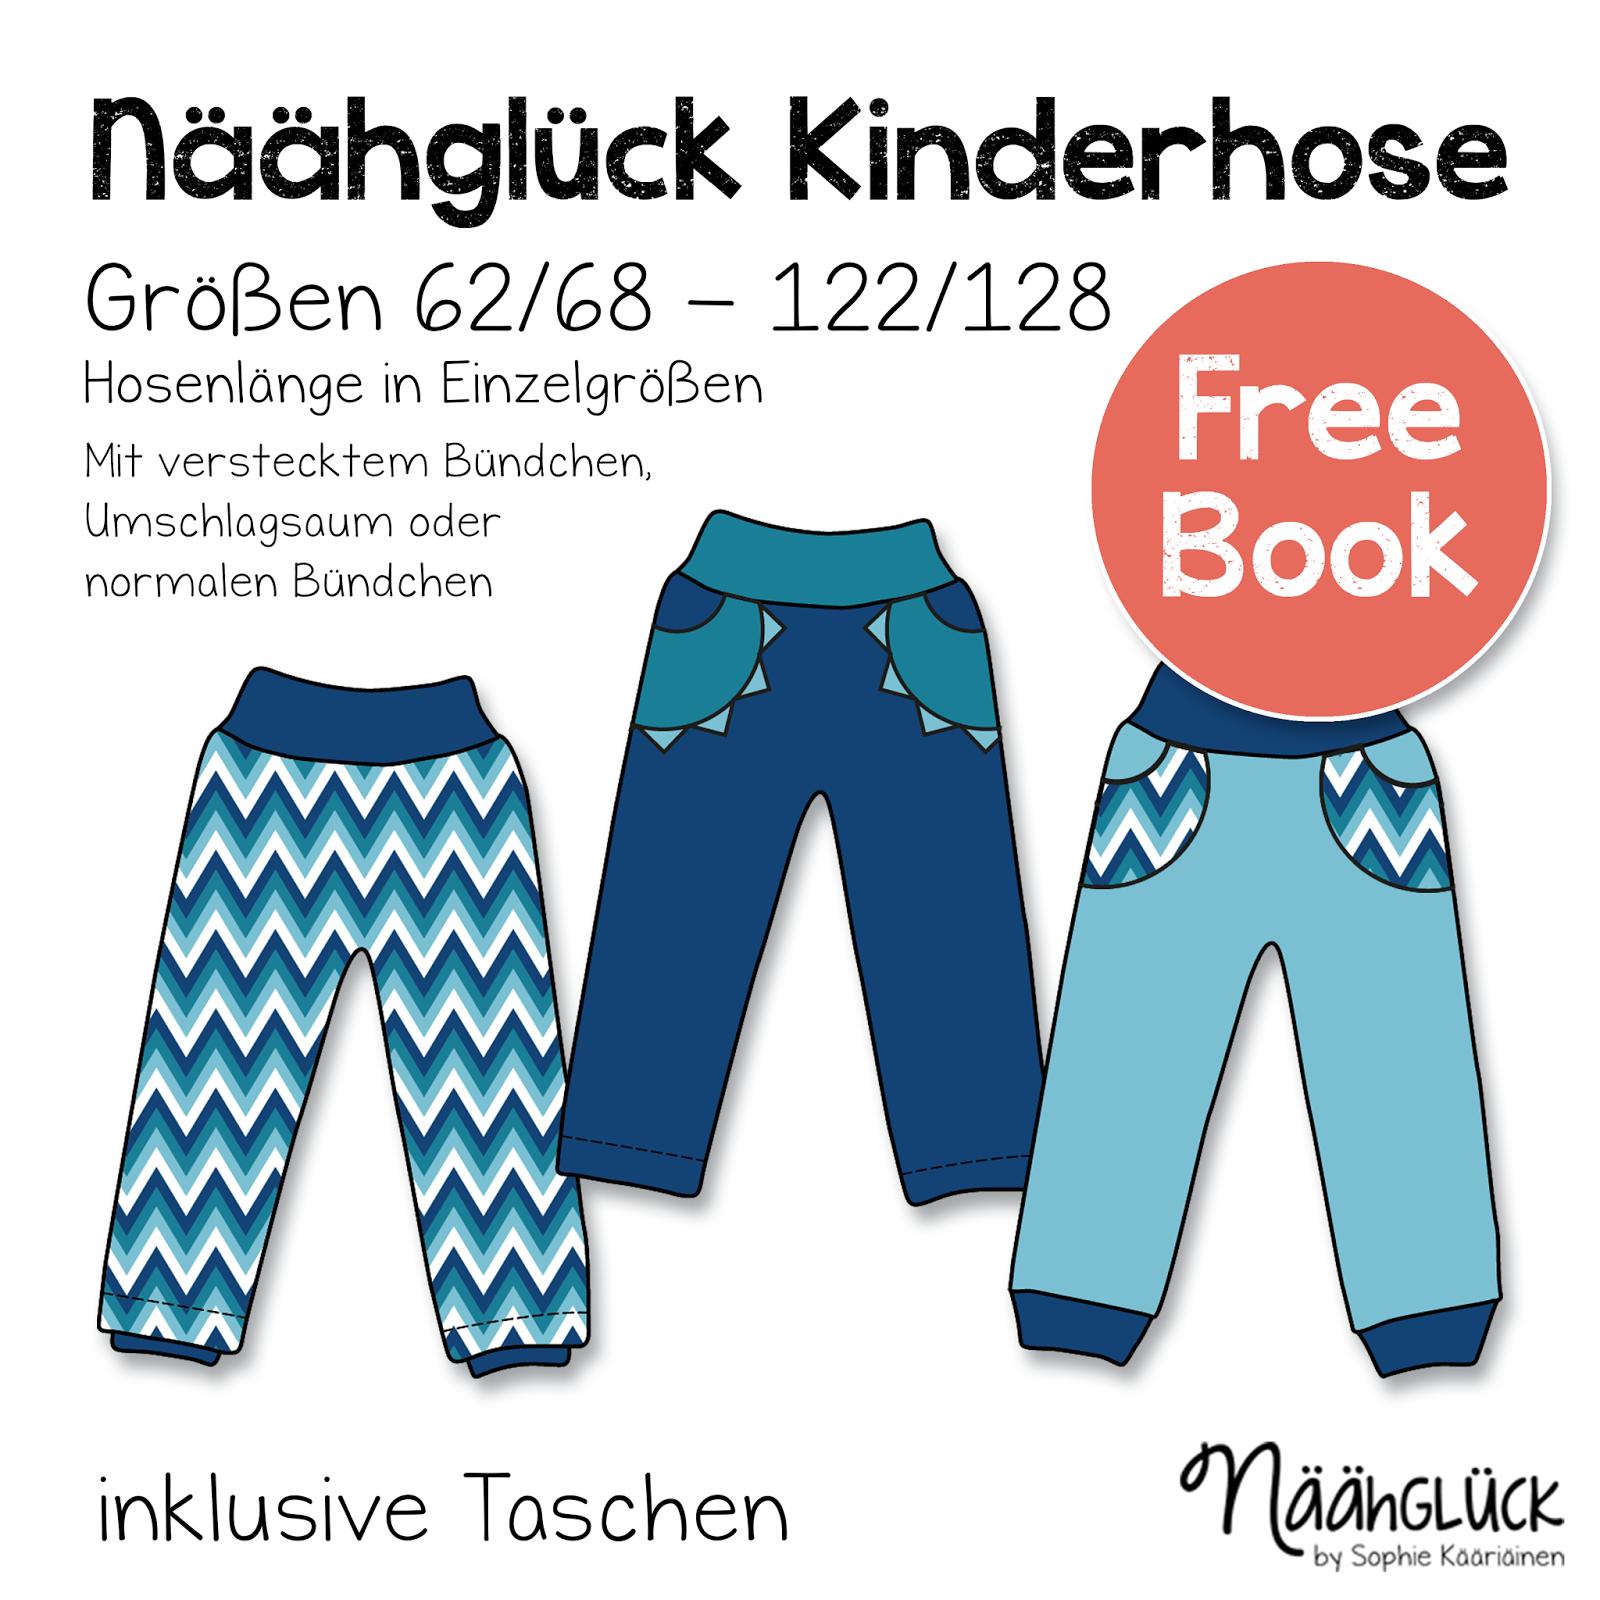 Näähglück by Sophie Kääriäinen: Kinderhose